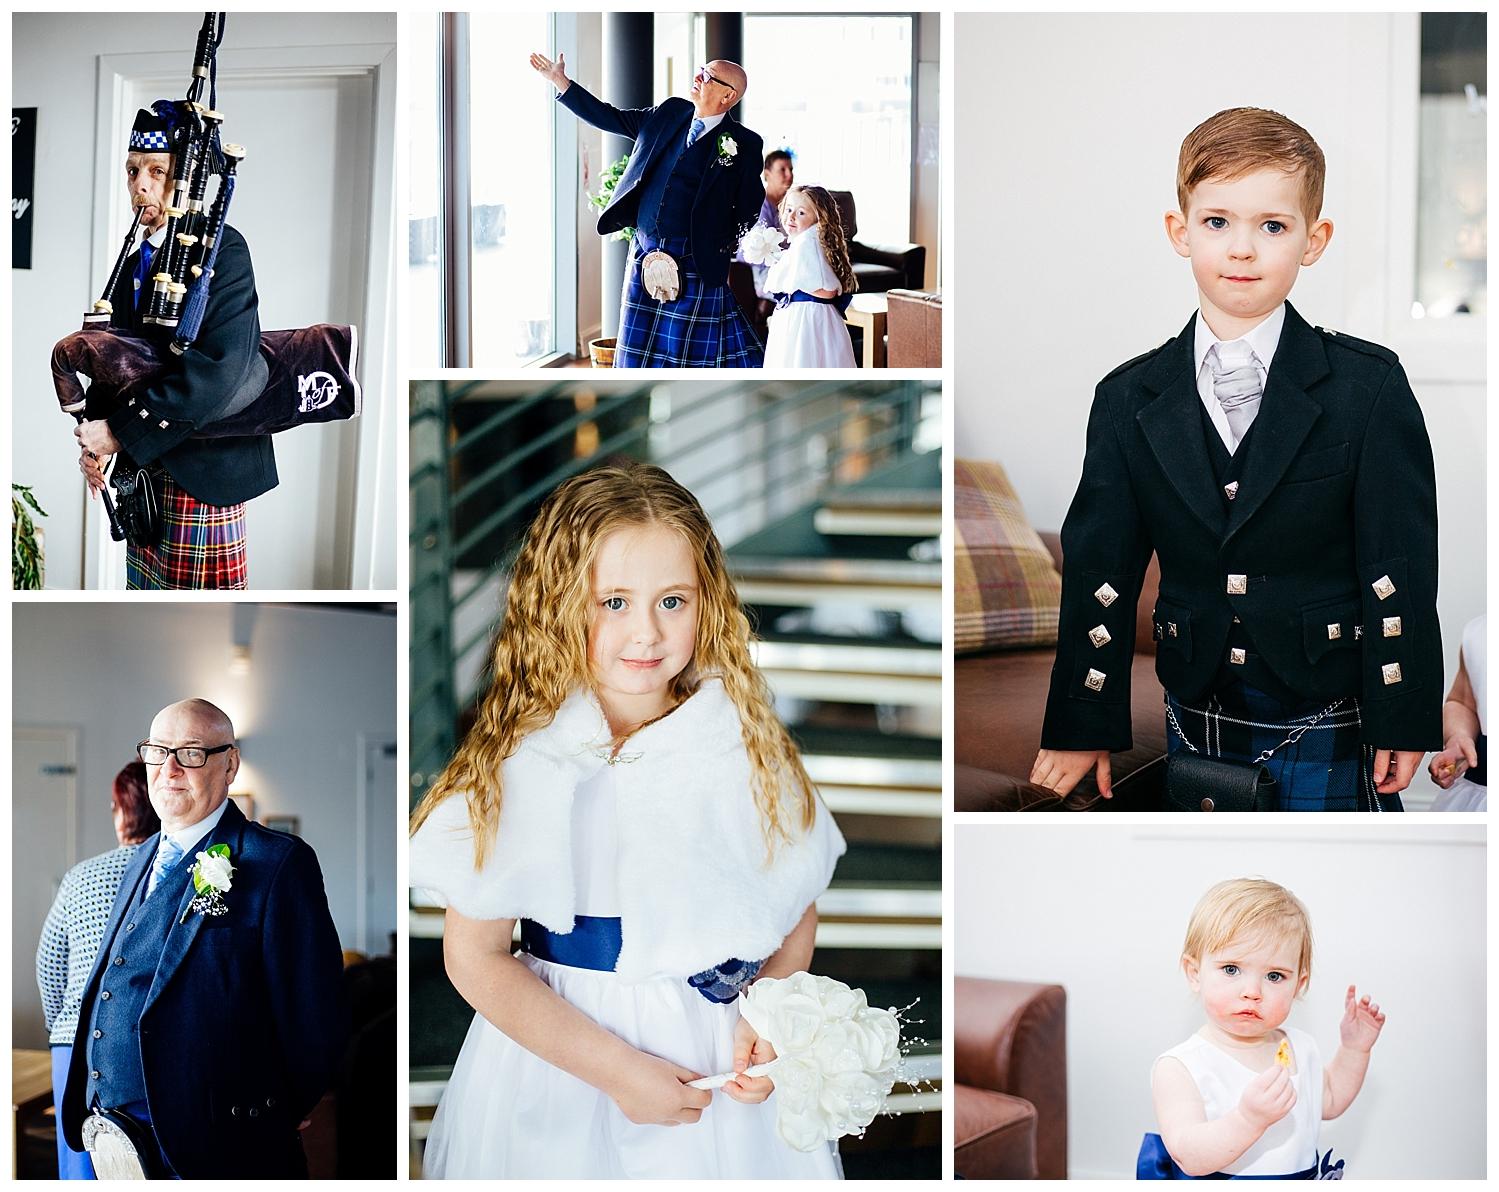 Kirsty_Brown_Wedding_Photography_0005.jpg